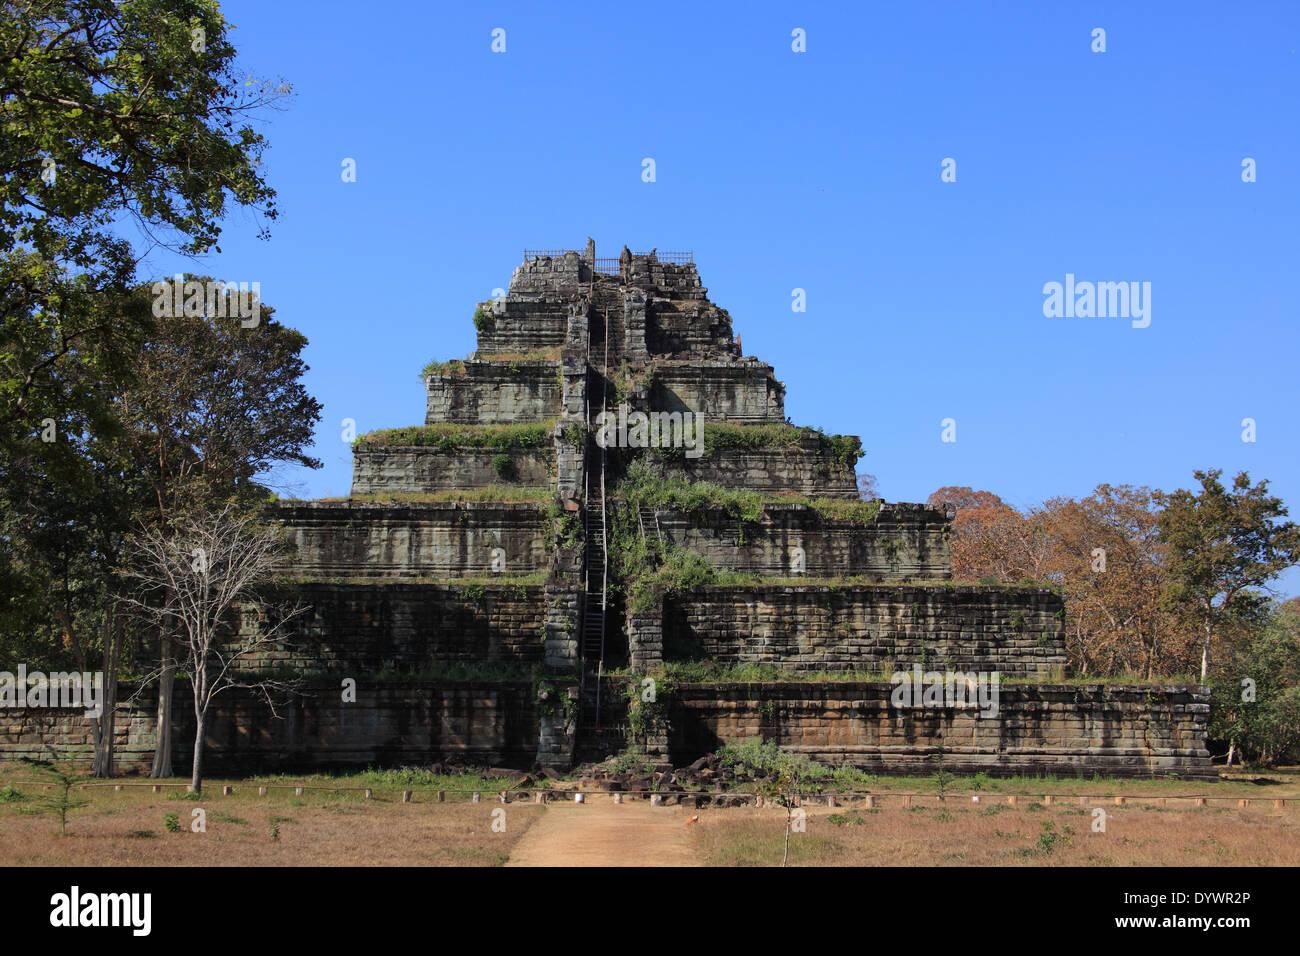 Koh Ker temple near Siem Reap, Cambodia - Stock Image